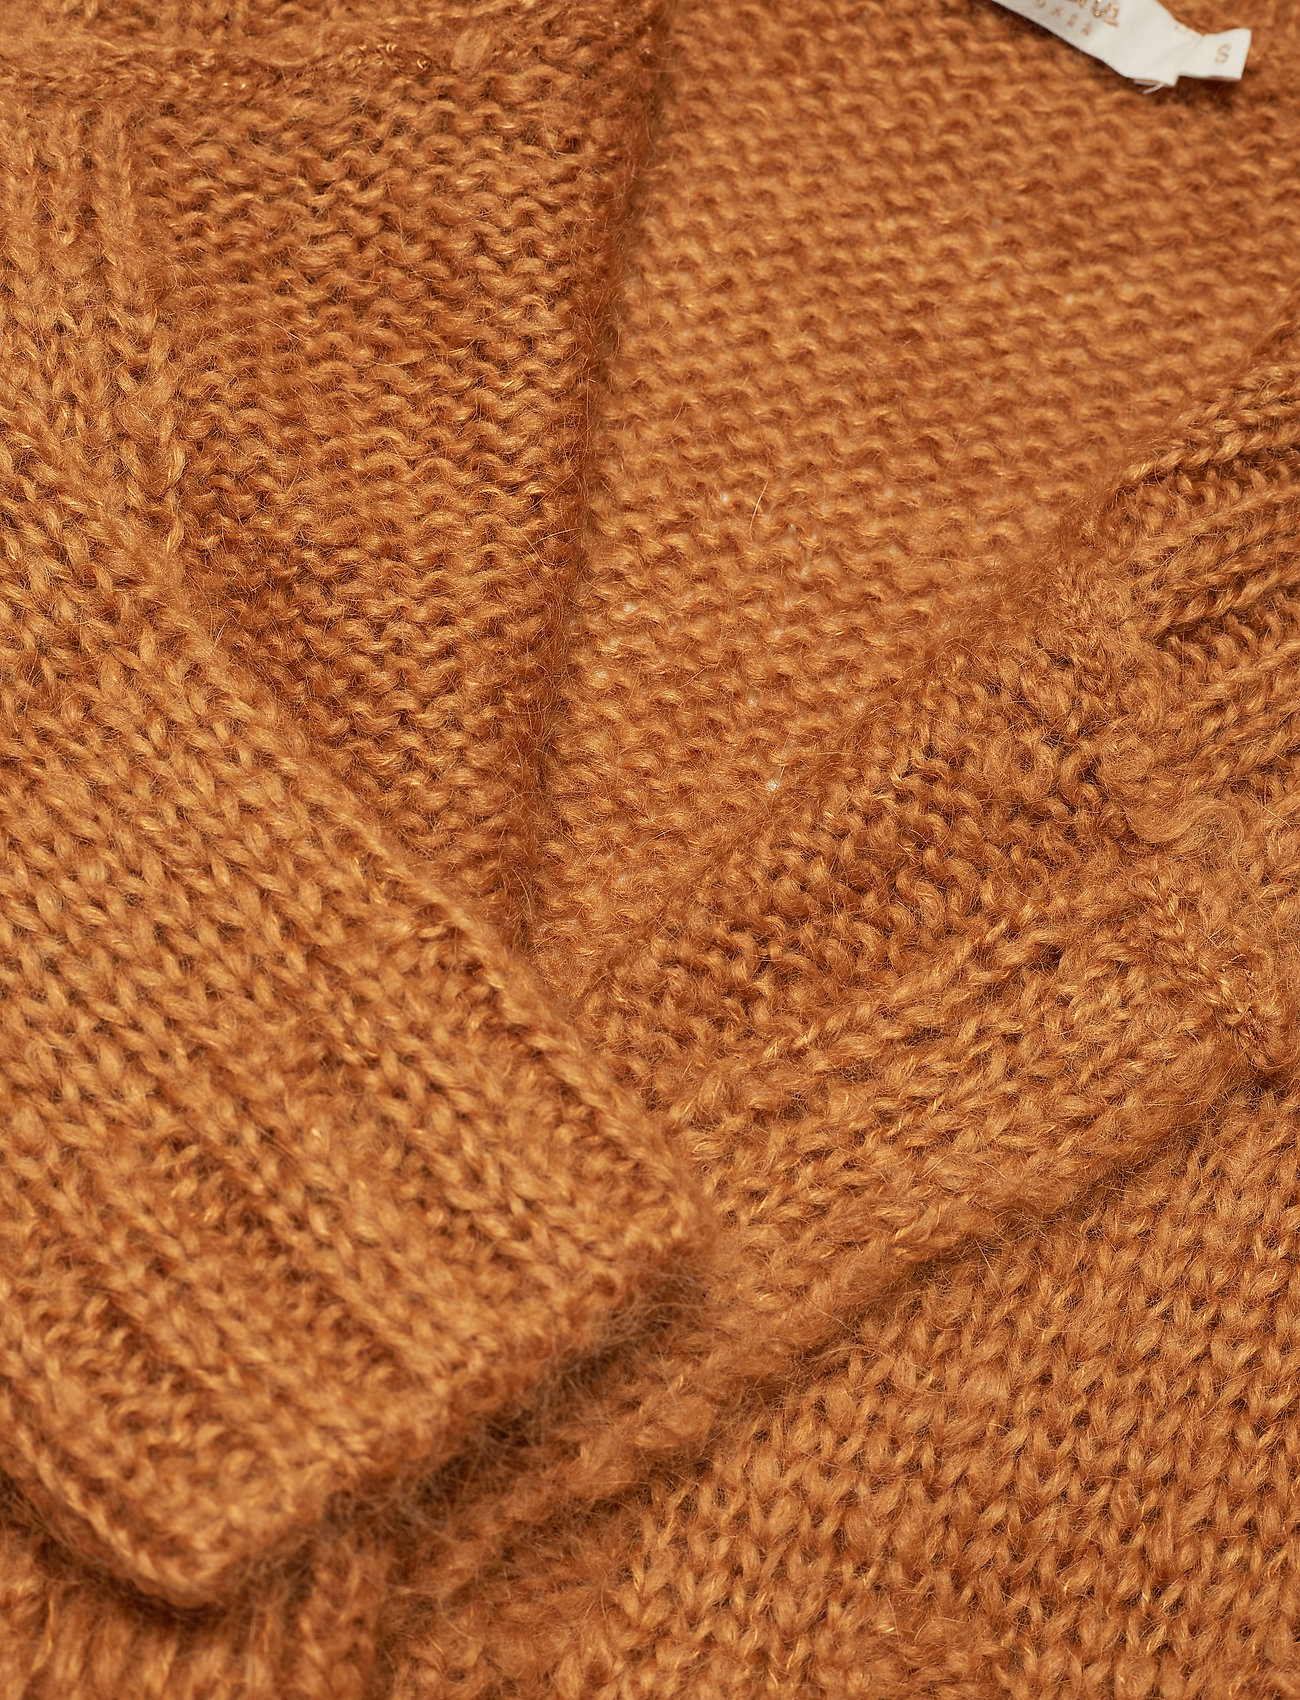 Knit Knit Croc CardigancaramelRabens CardigancaramelRabens Saloner Croc HDE9I2